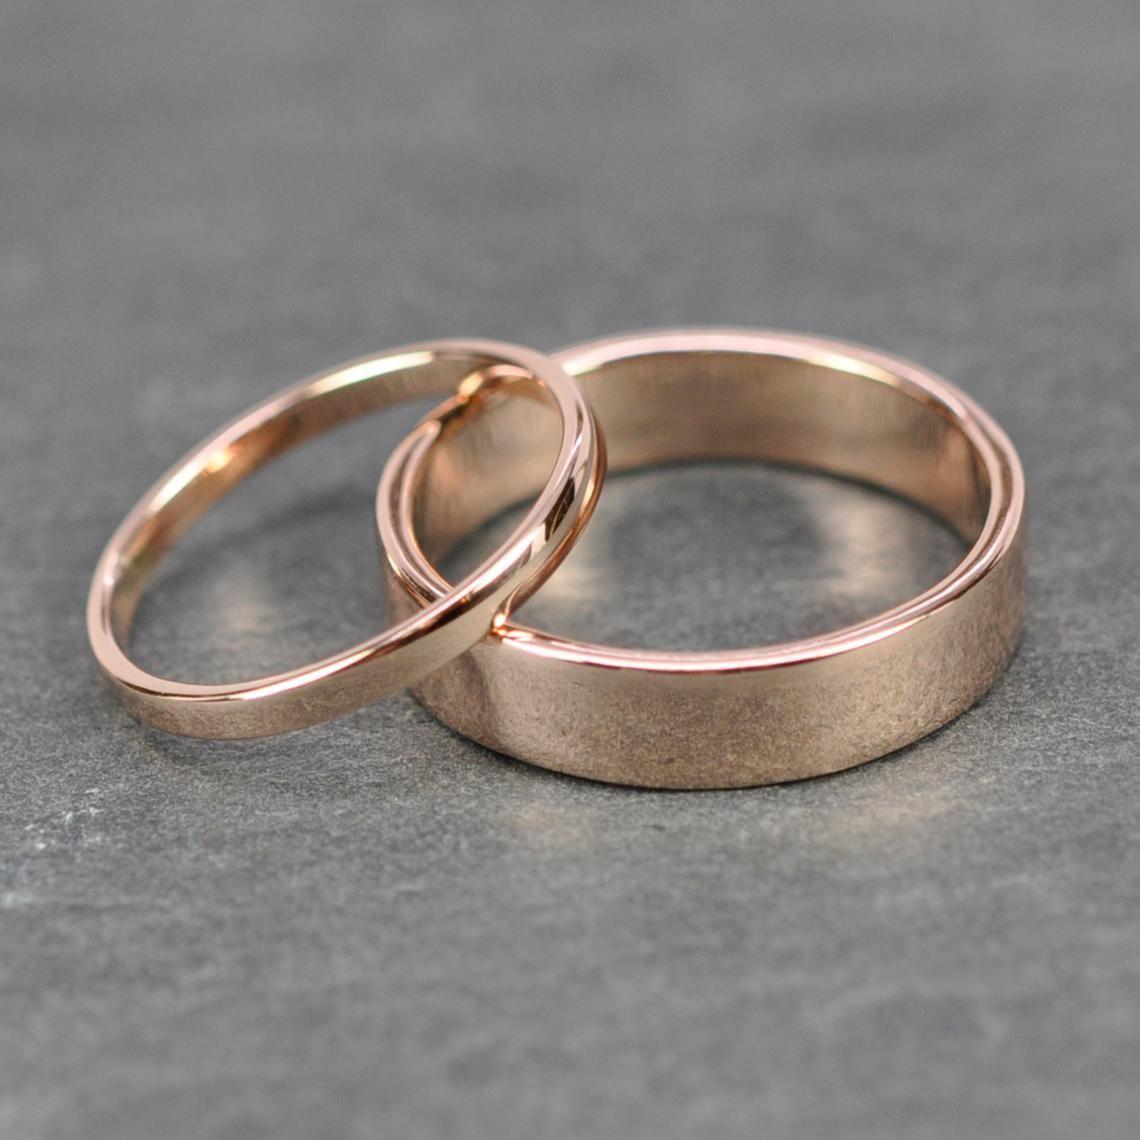 Rose Gold Ehering Set, 2mm und 5mm Ringe, 14K Rose Gold, glatt poliert, Rutledge Juweliere